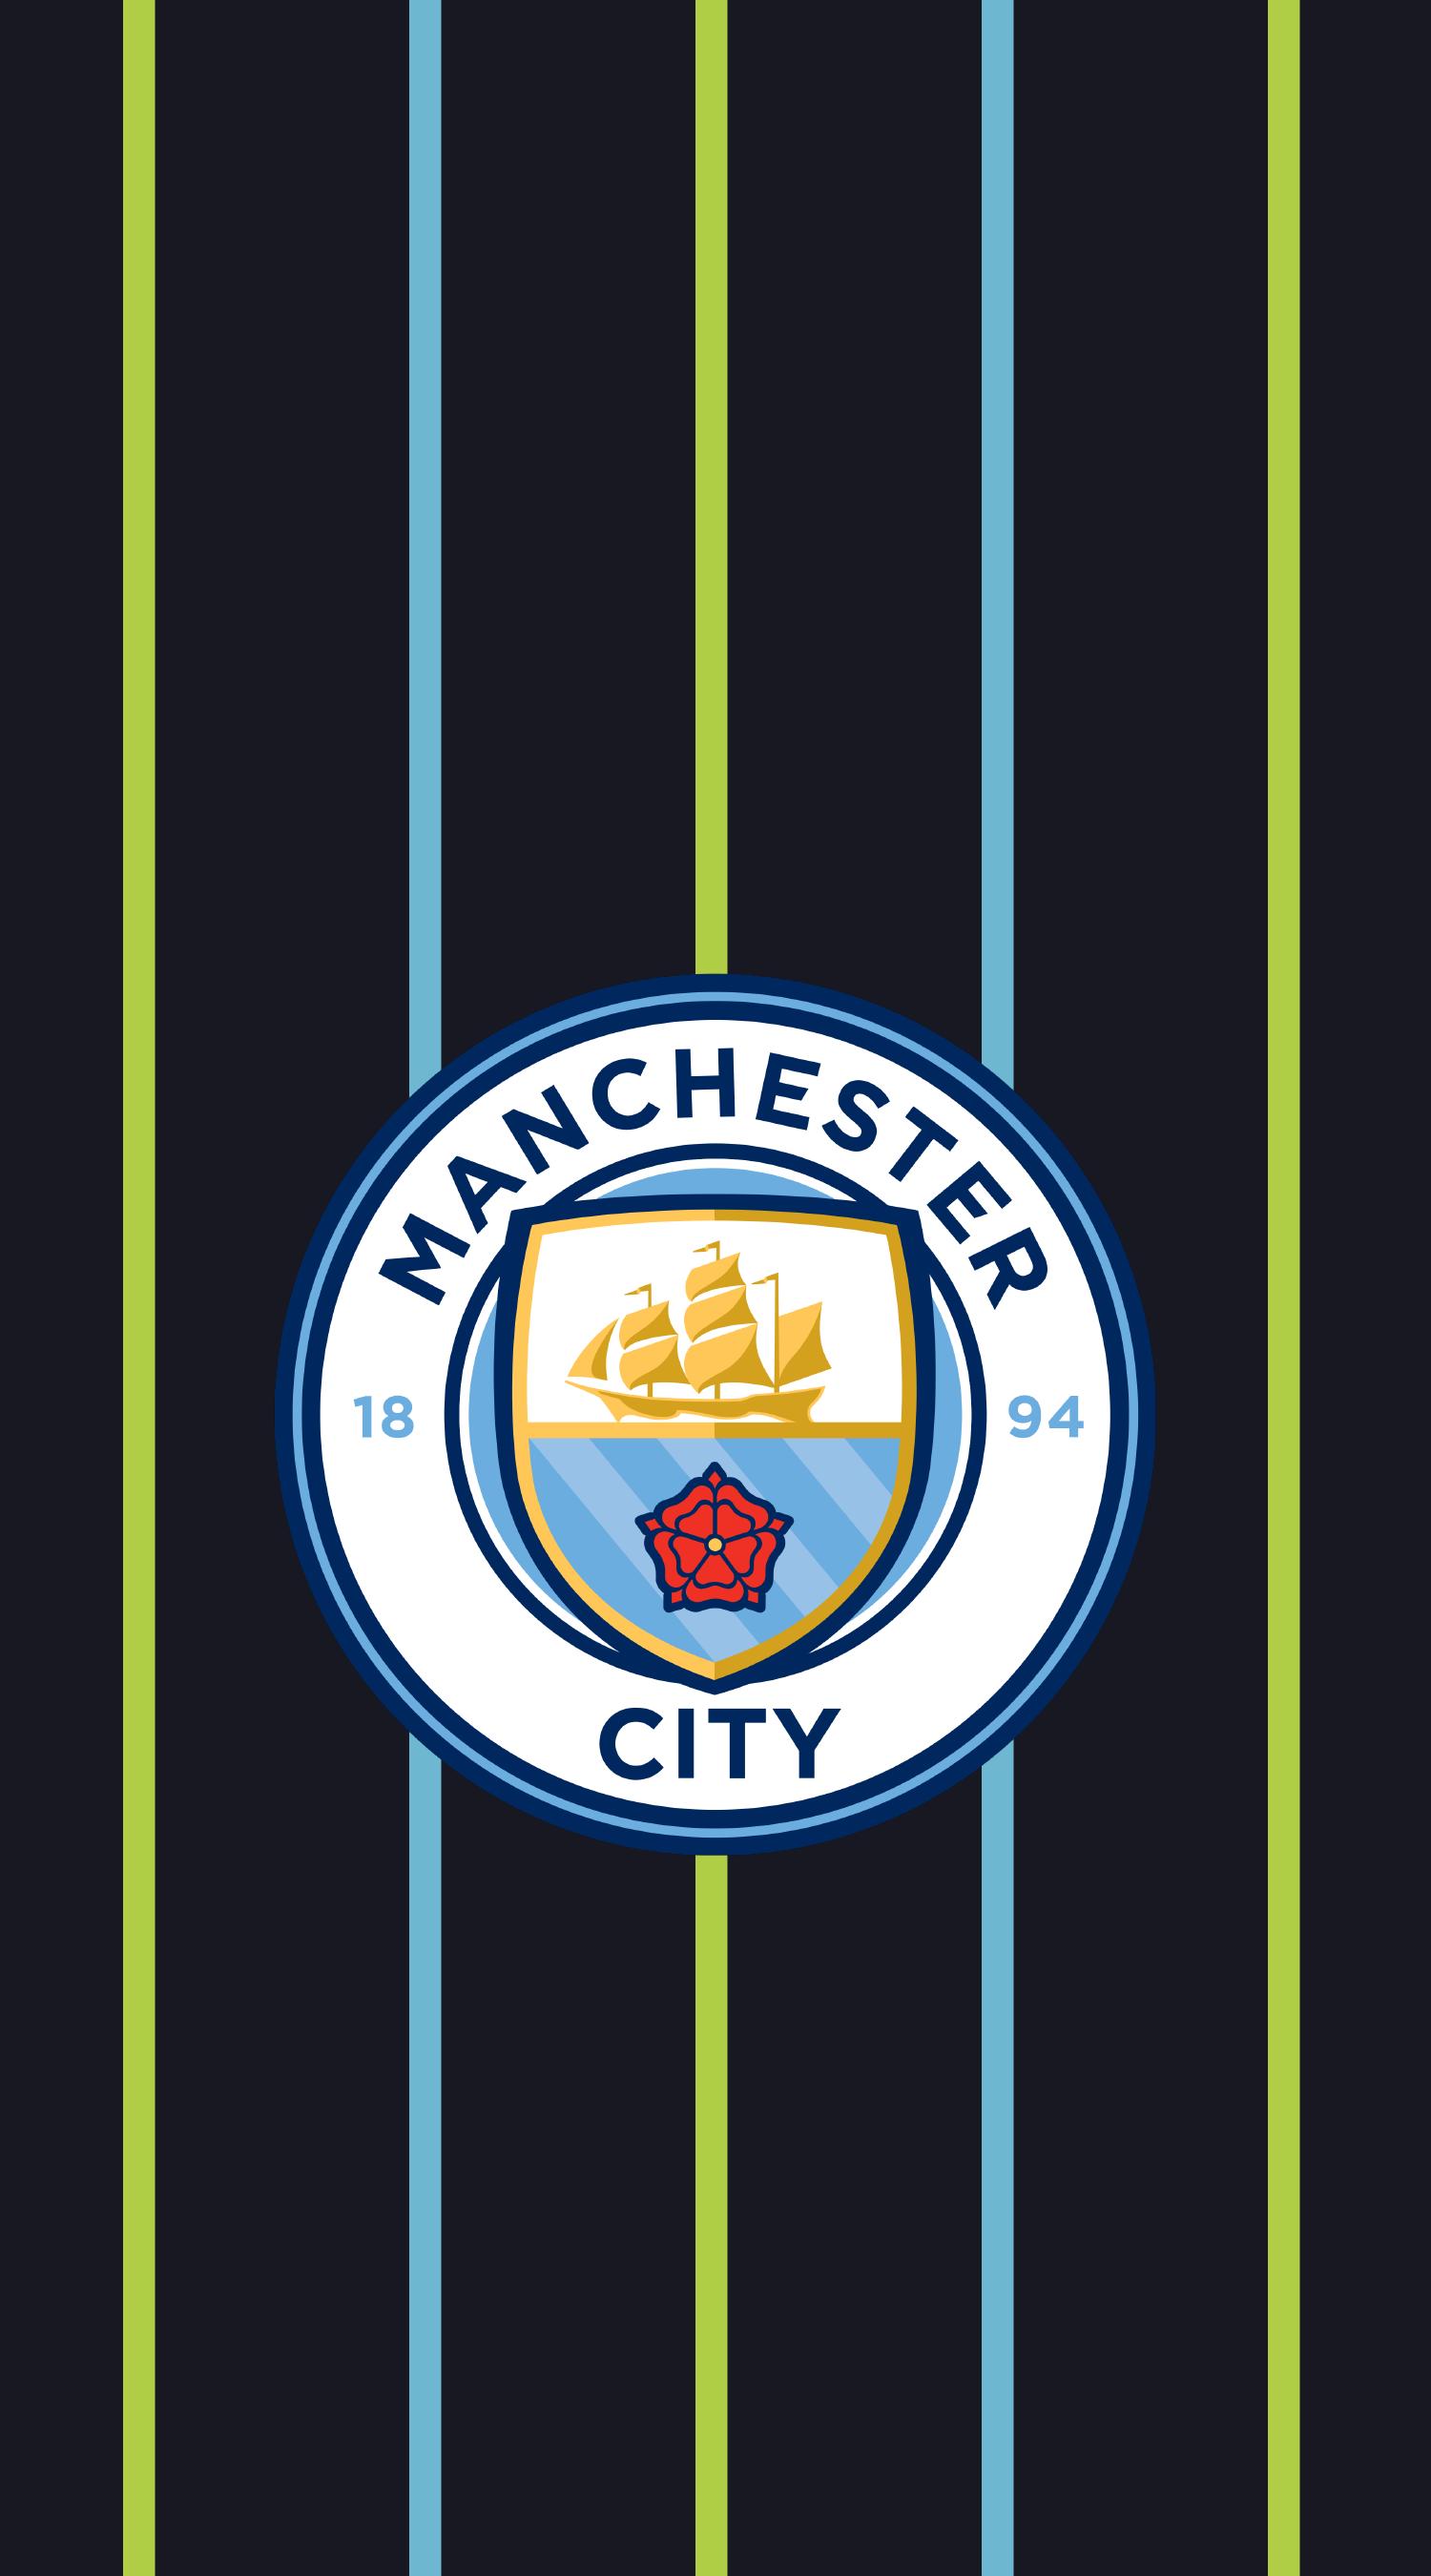 13 Manchester City 2018 Wallpapers On Wallpapersafari